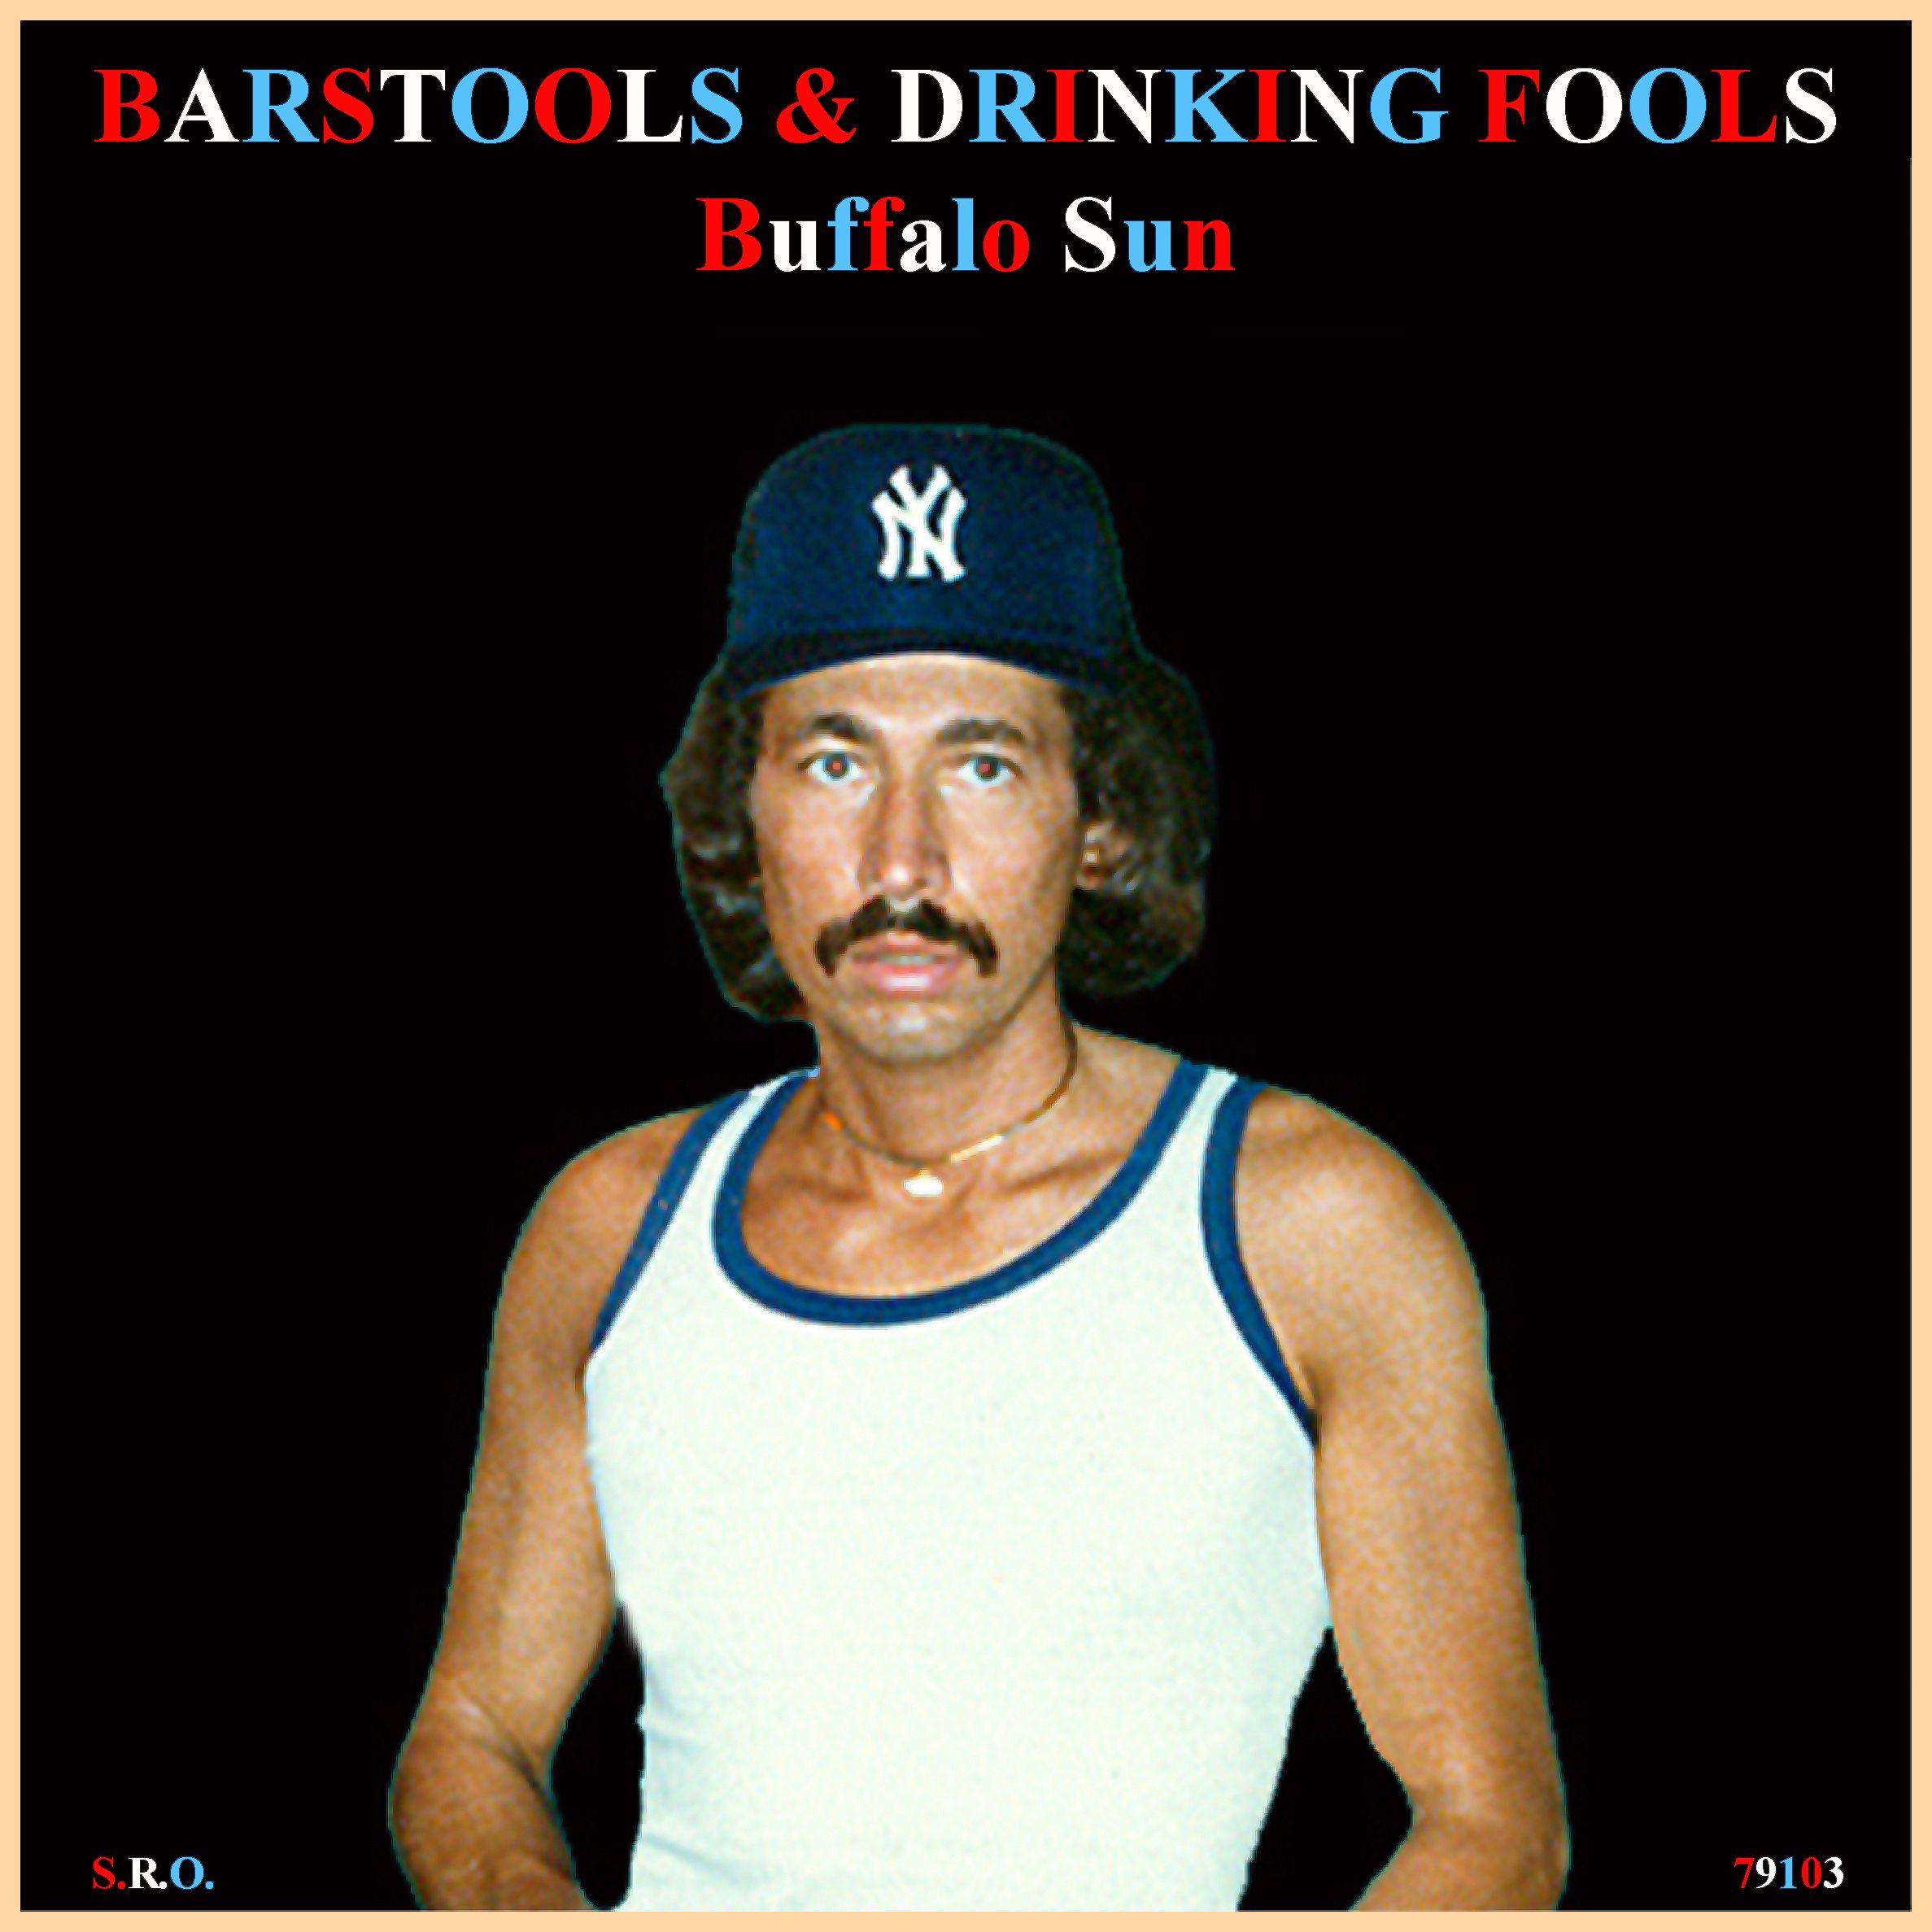 Buffalo Sun Bar Stools And Drinking Fools S R O